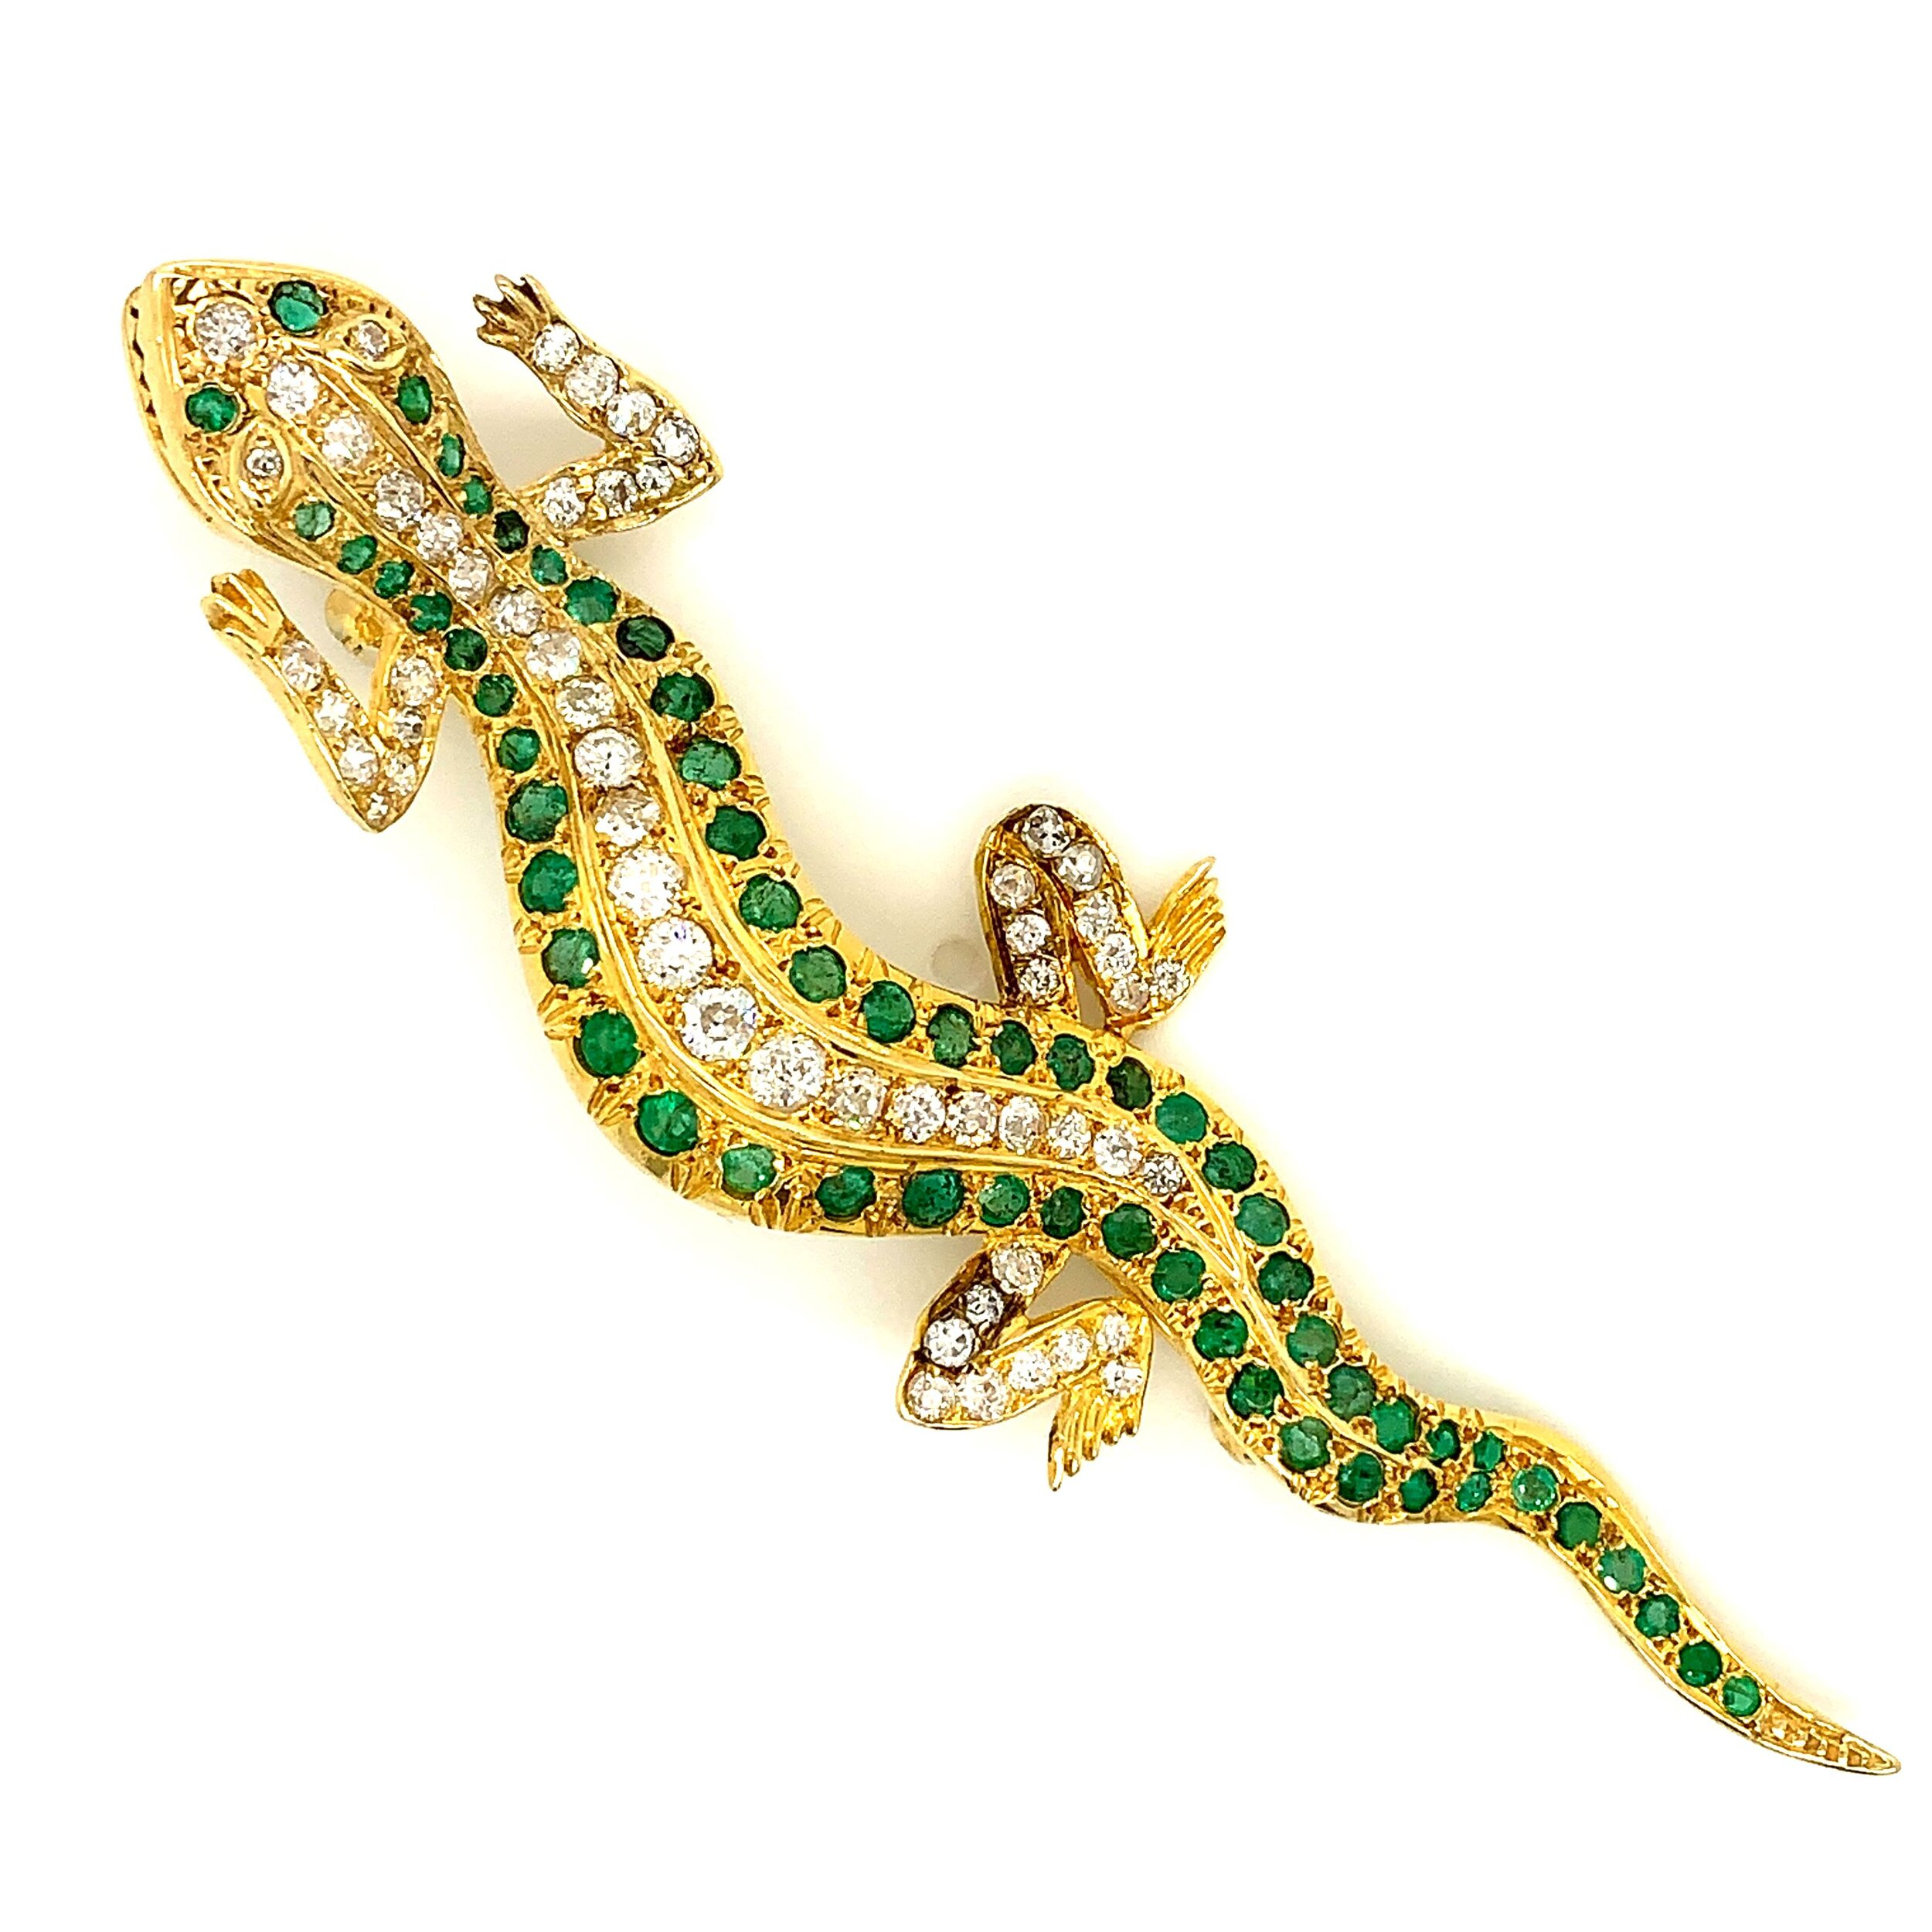 Victorian Salamander Brooch Adorned with Tsavorite and Diamonds in 18 Karat Gold.  Est. US$ 3,000-5,000